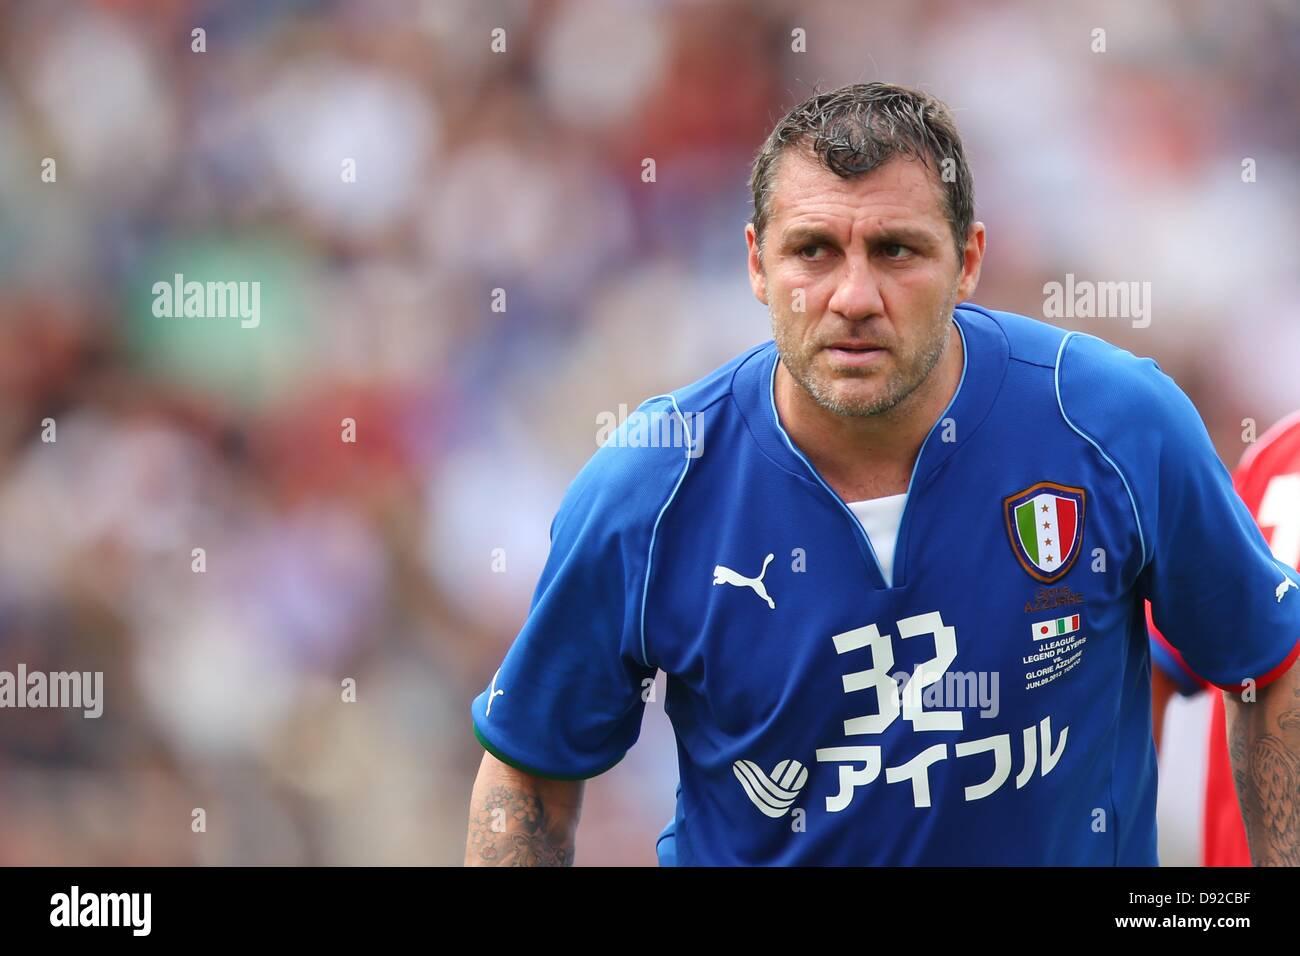 Christian Vieri ITA JUNE 9 2013 Football Soccer Stock